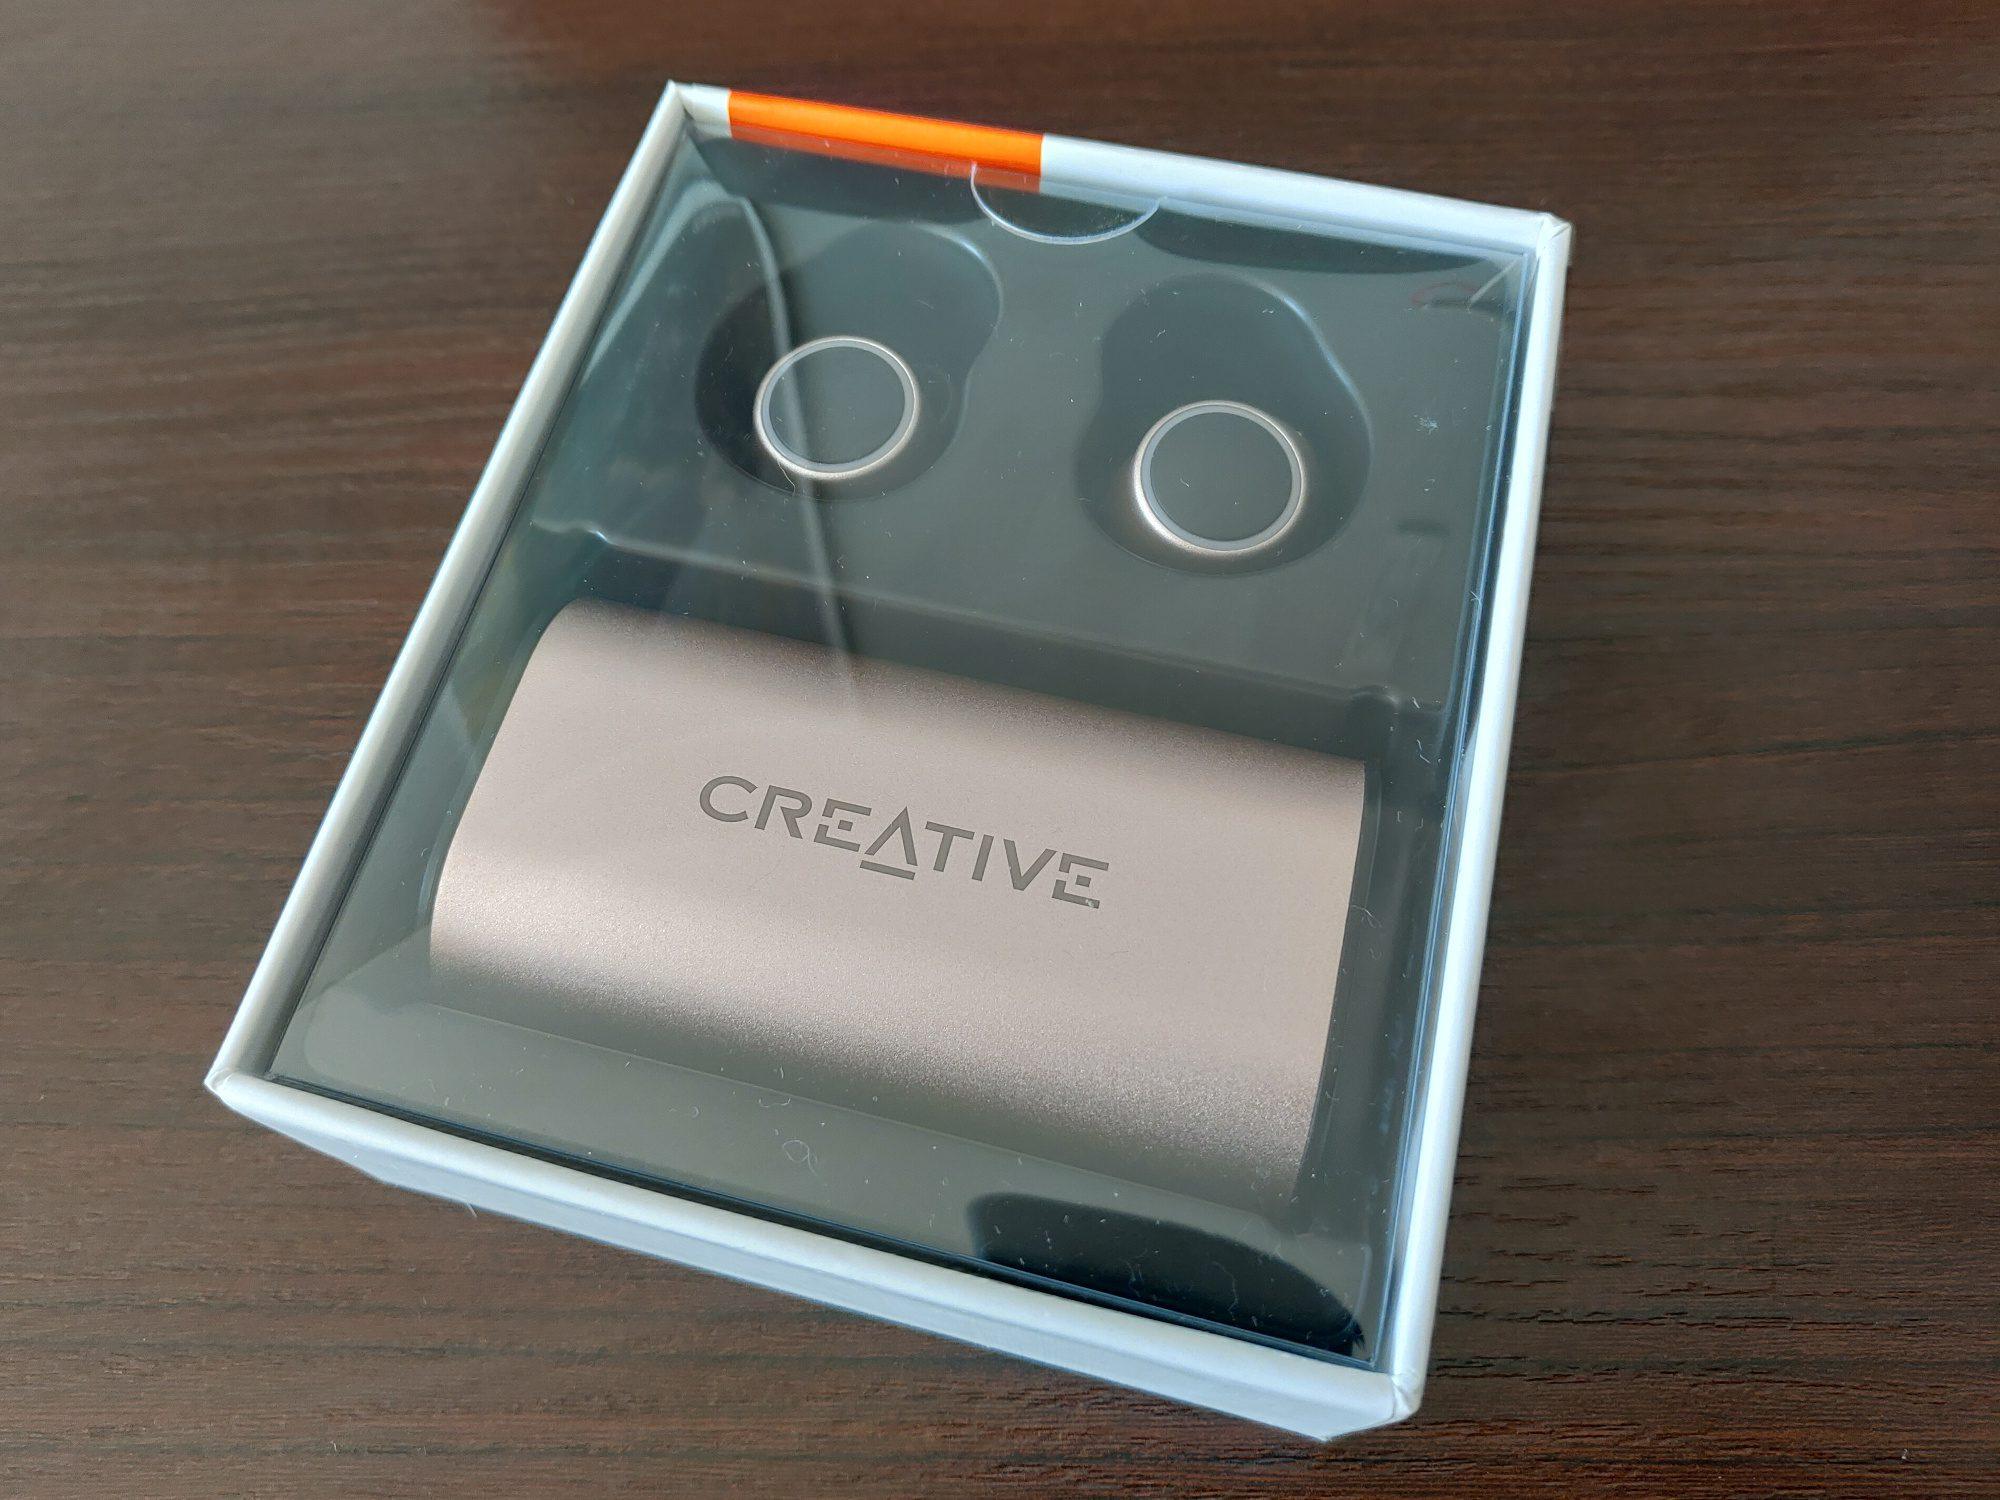 Creative Outlier Gold wnętrze pudełka